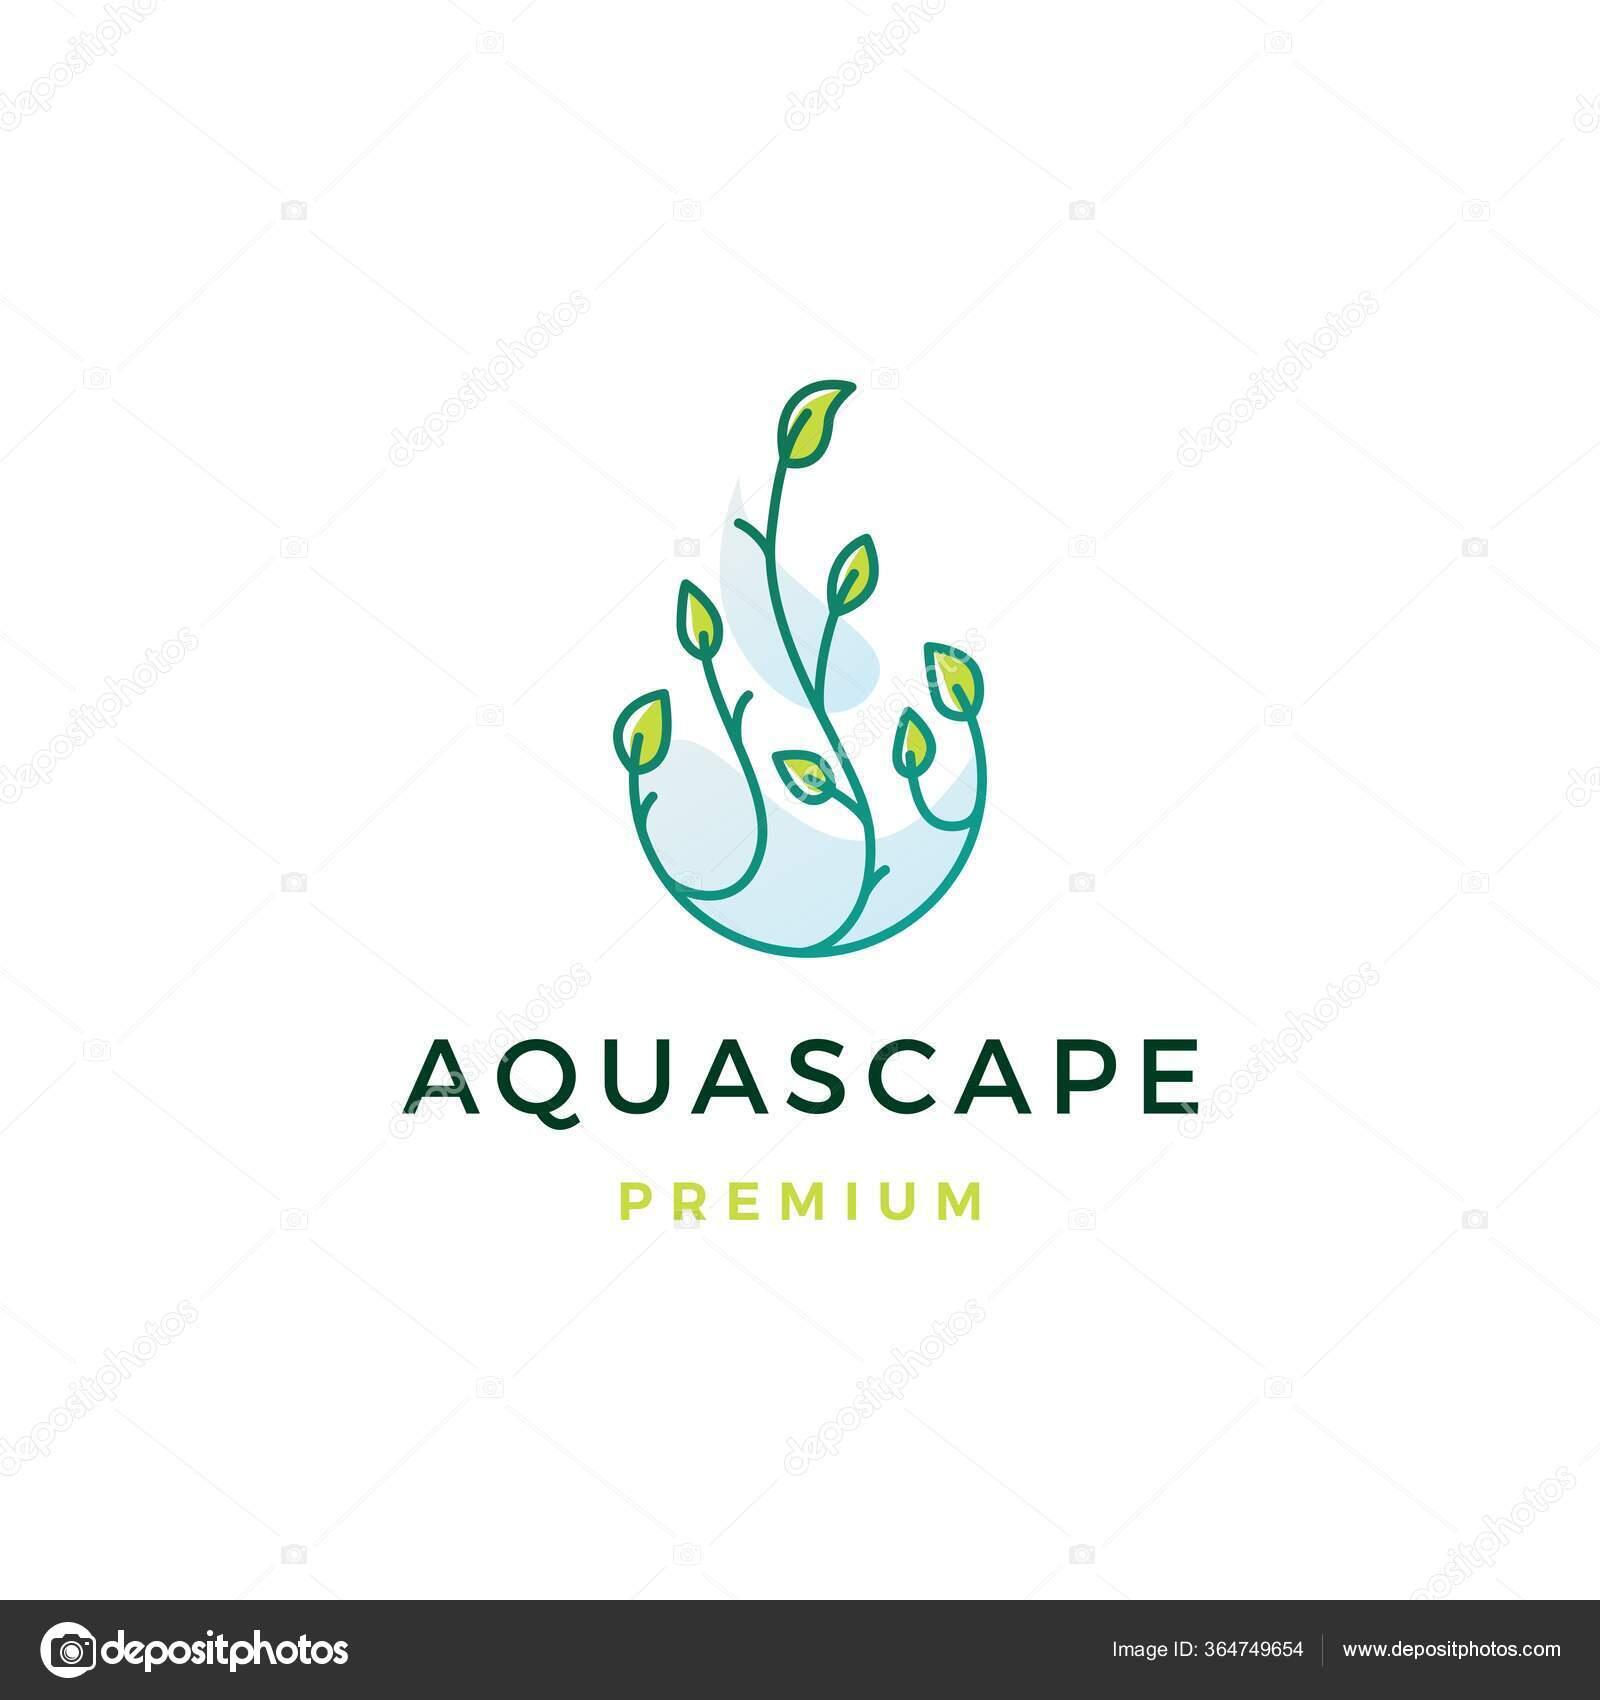 Aquascape Leaf Tree Water Drop Logo Vector Icon Illustration Stock Vector C Gagavastard 364749654